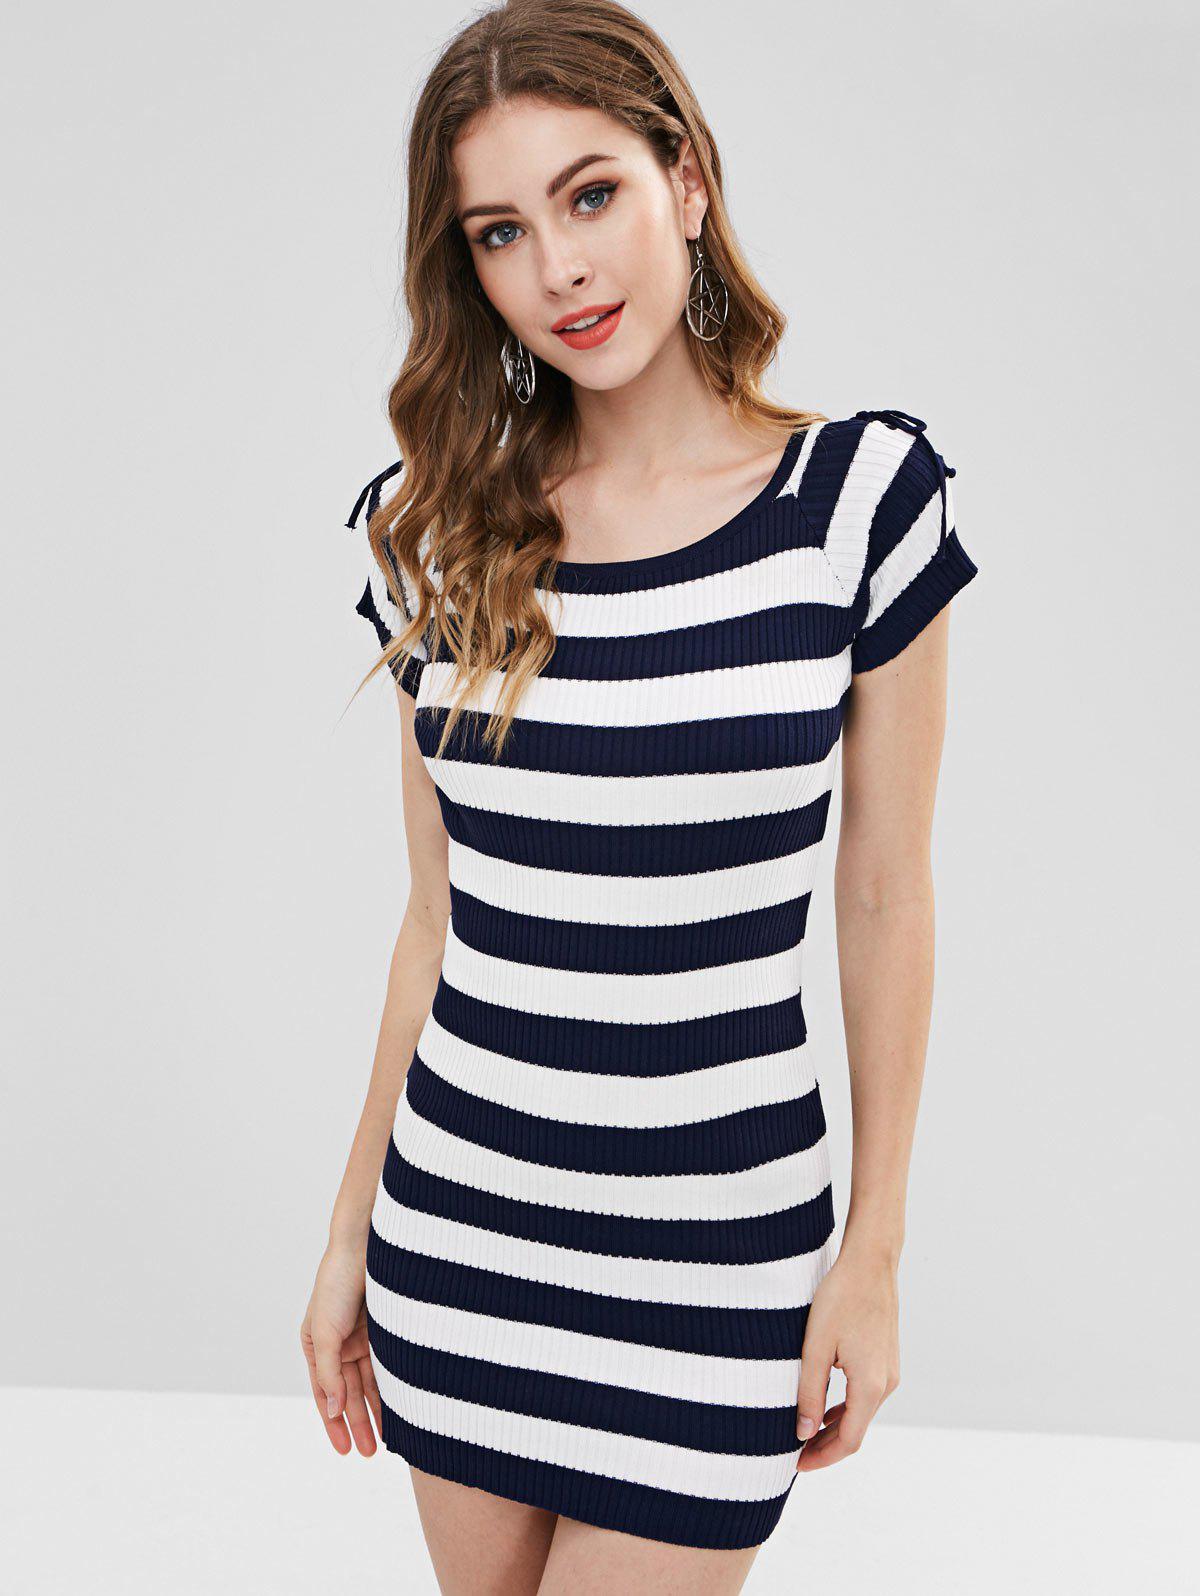 Striped Lace-up Knit Bodycon Dress, Multi